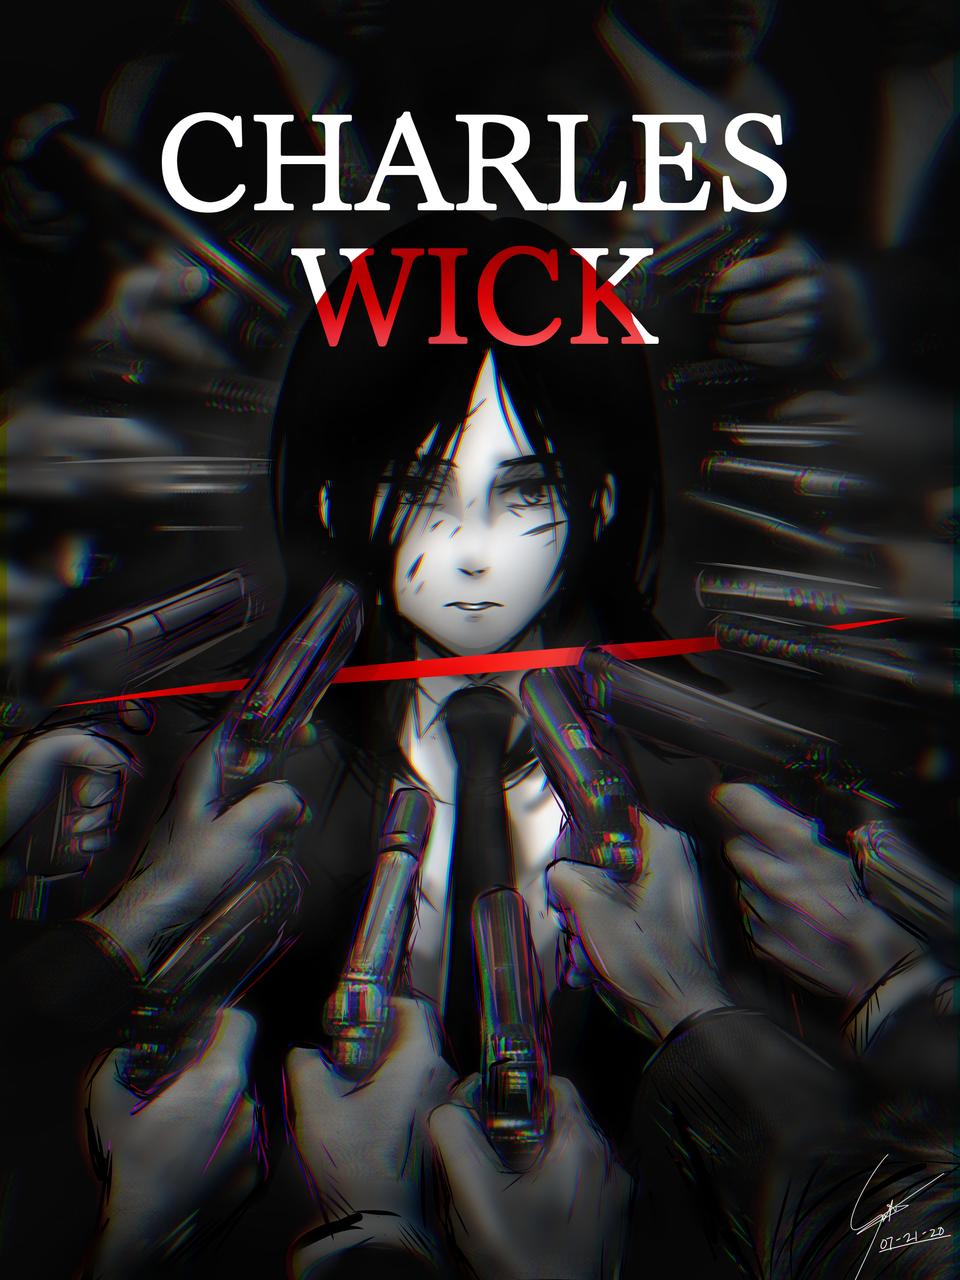 John Wick poster parodies w/ my OCs Illust of Ecchiban-Sensei Badass oc Hitman parody johnwick